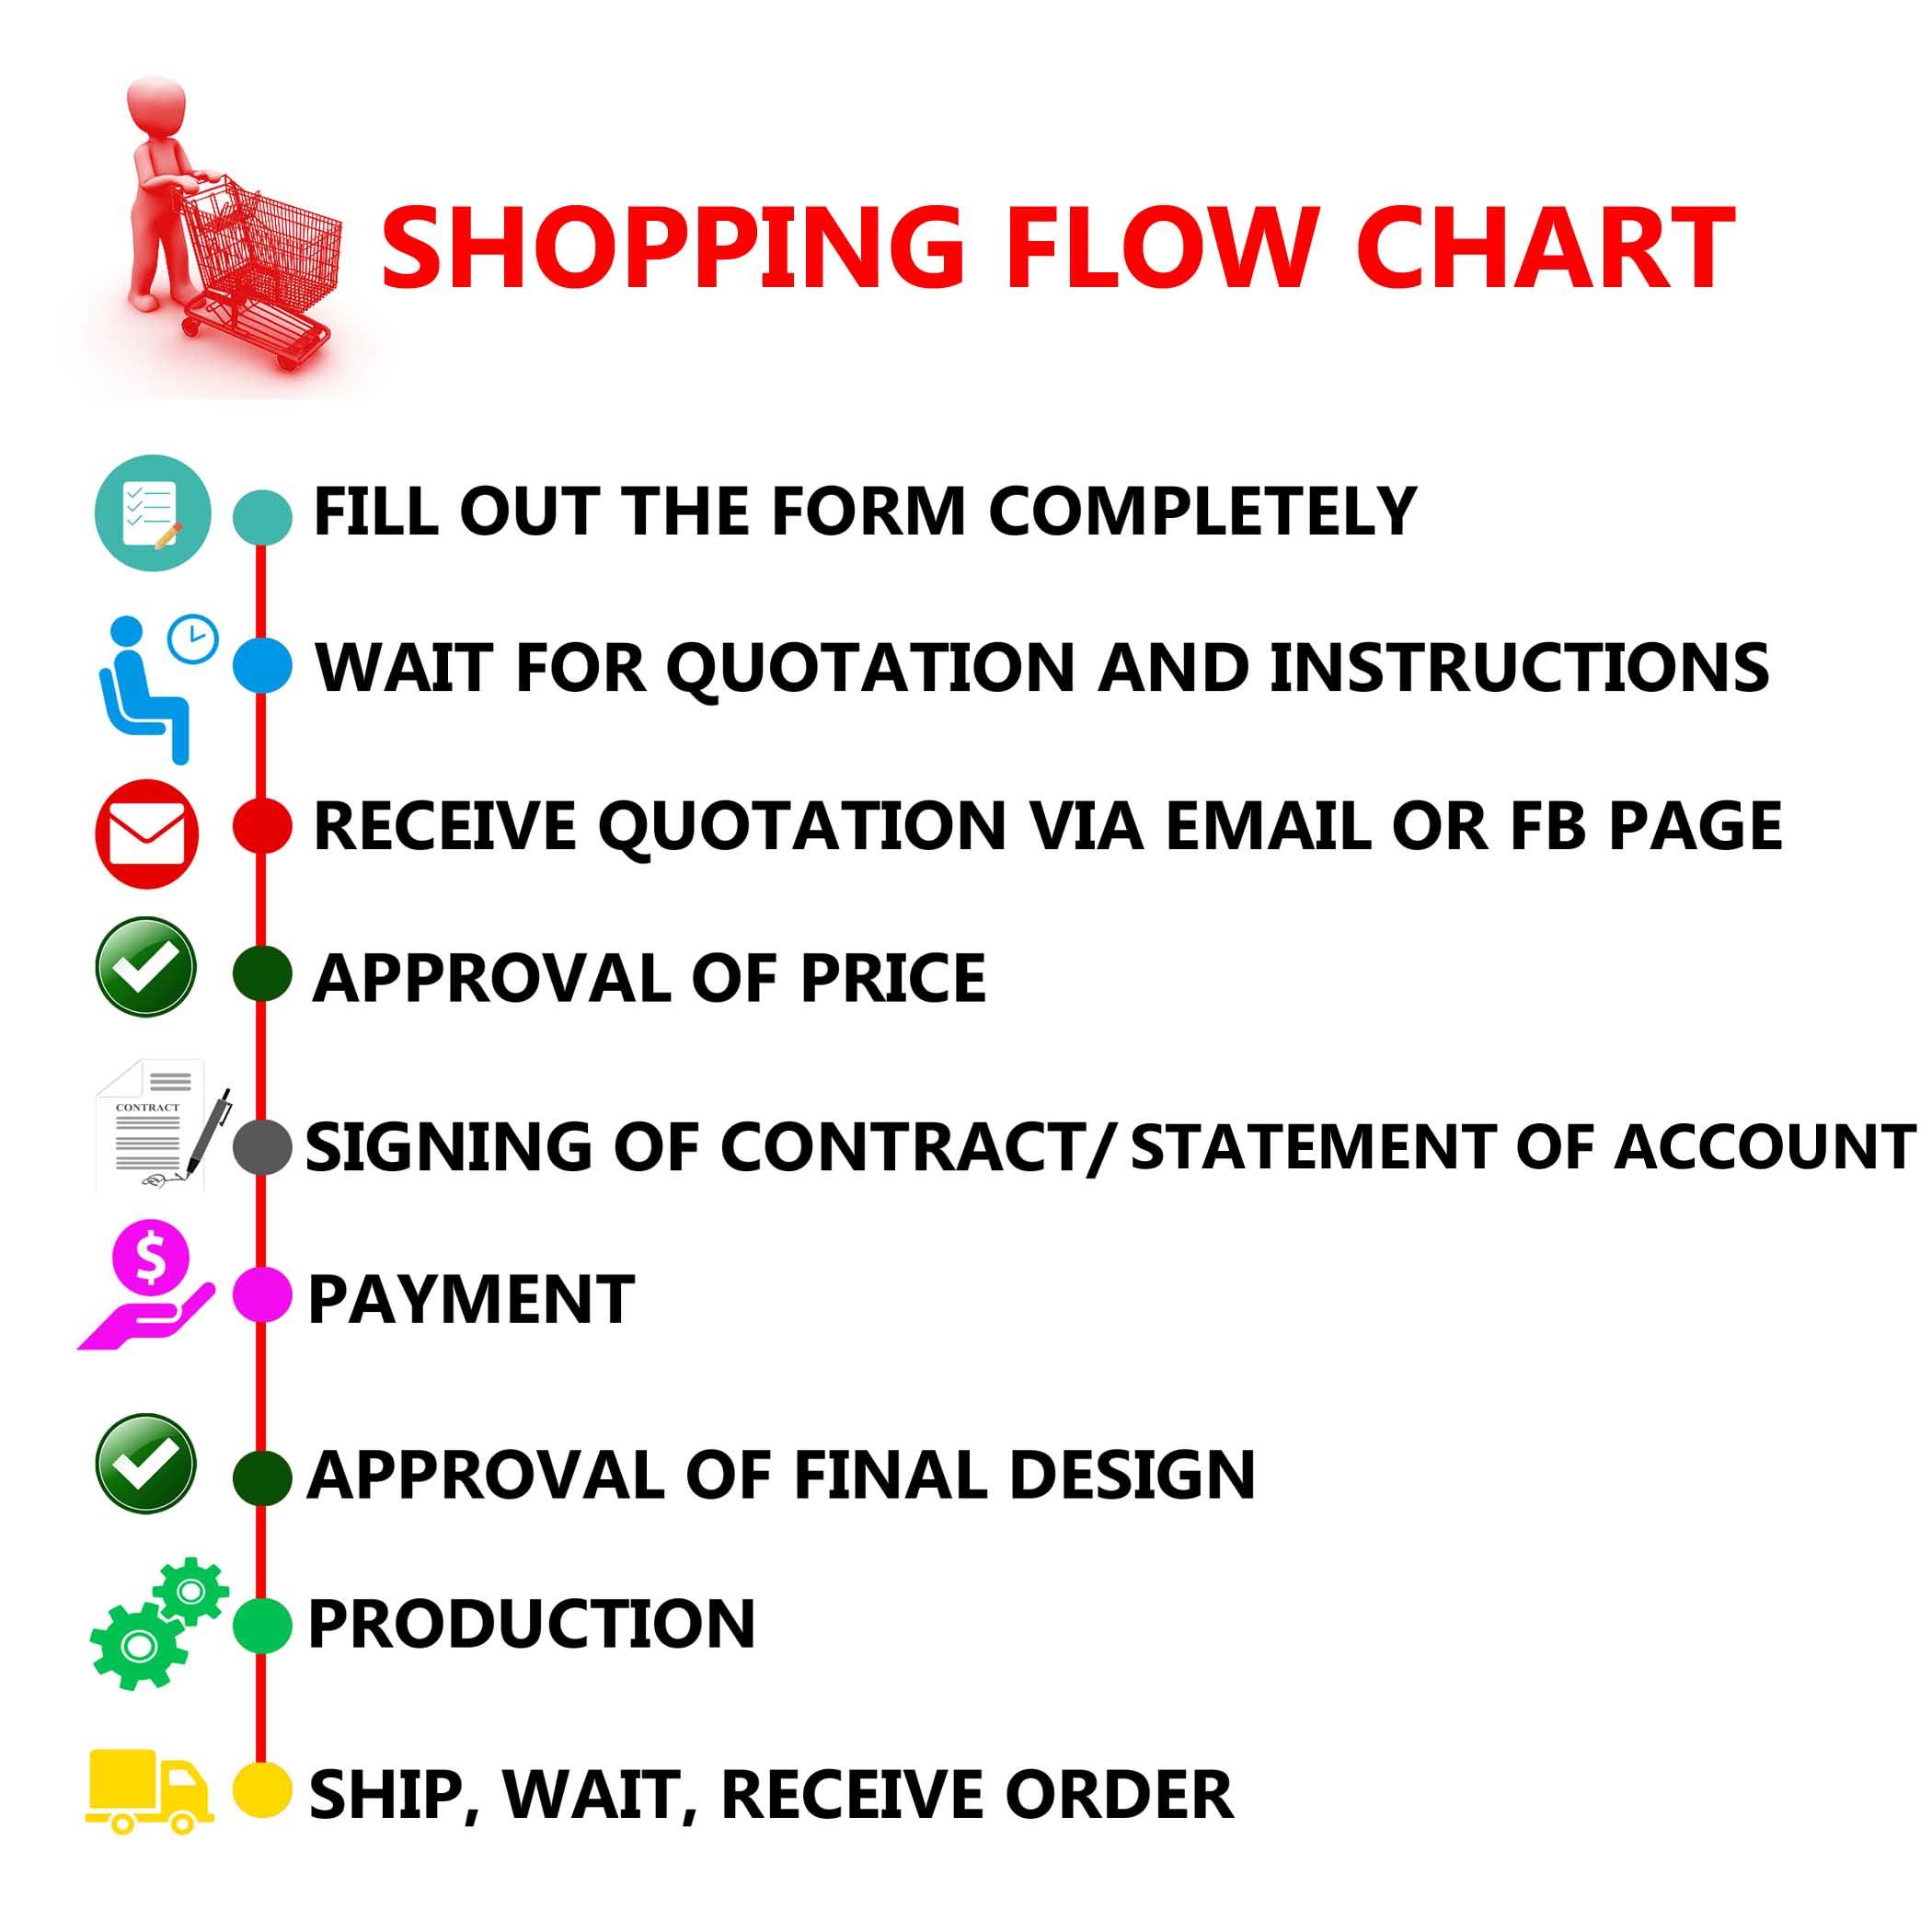 ORDER FLOW CHART